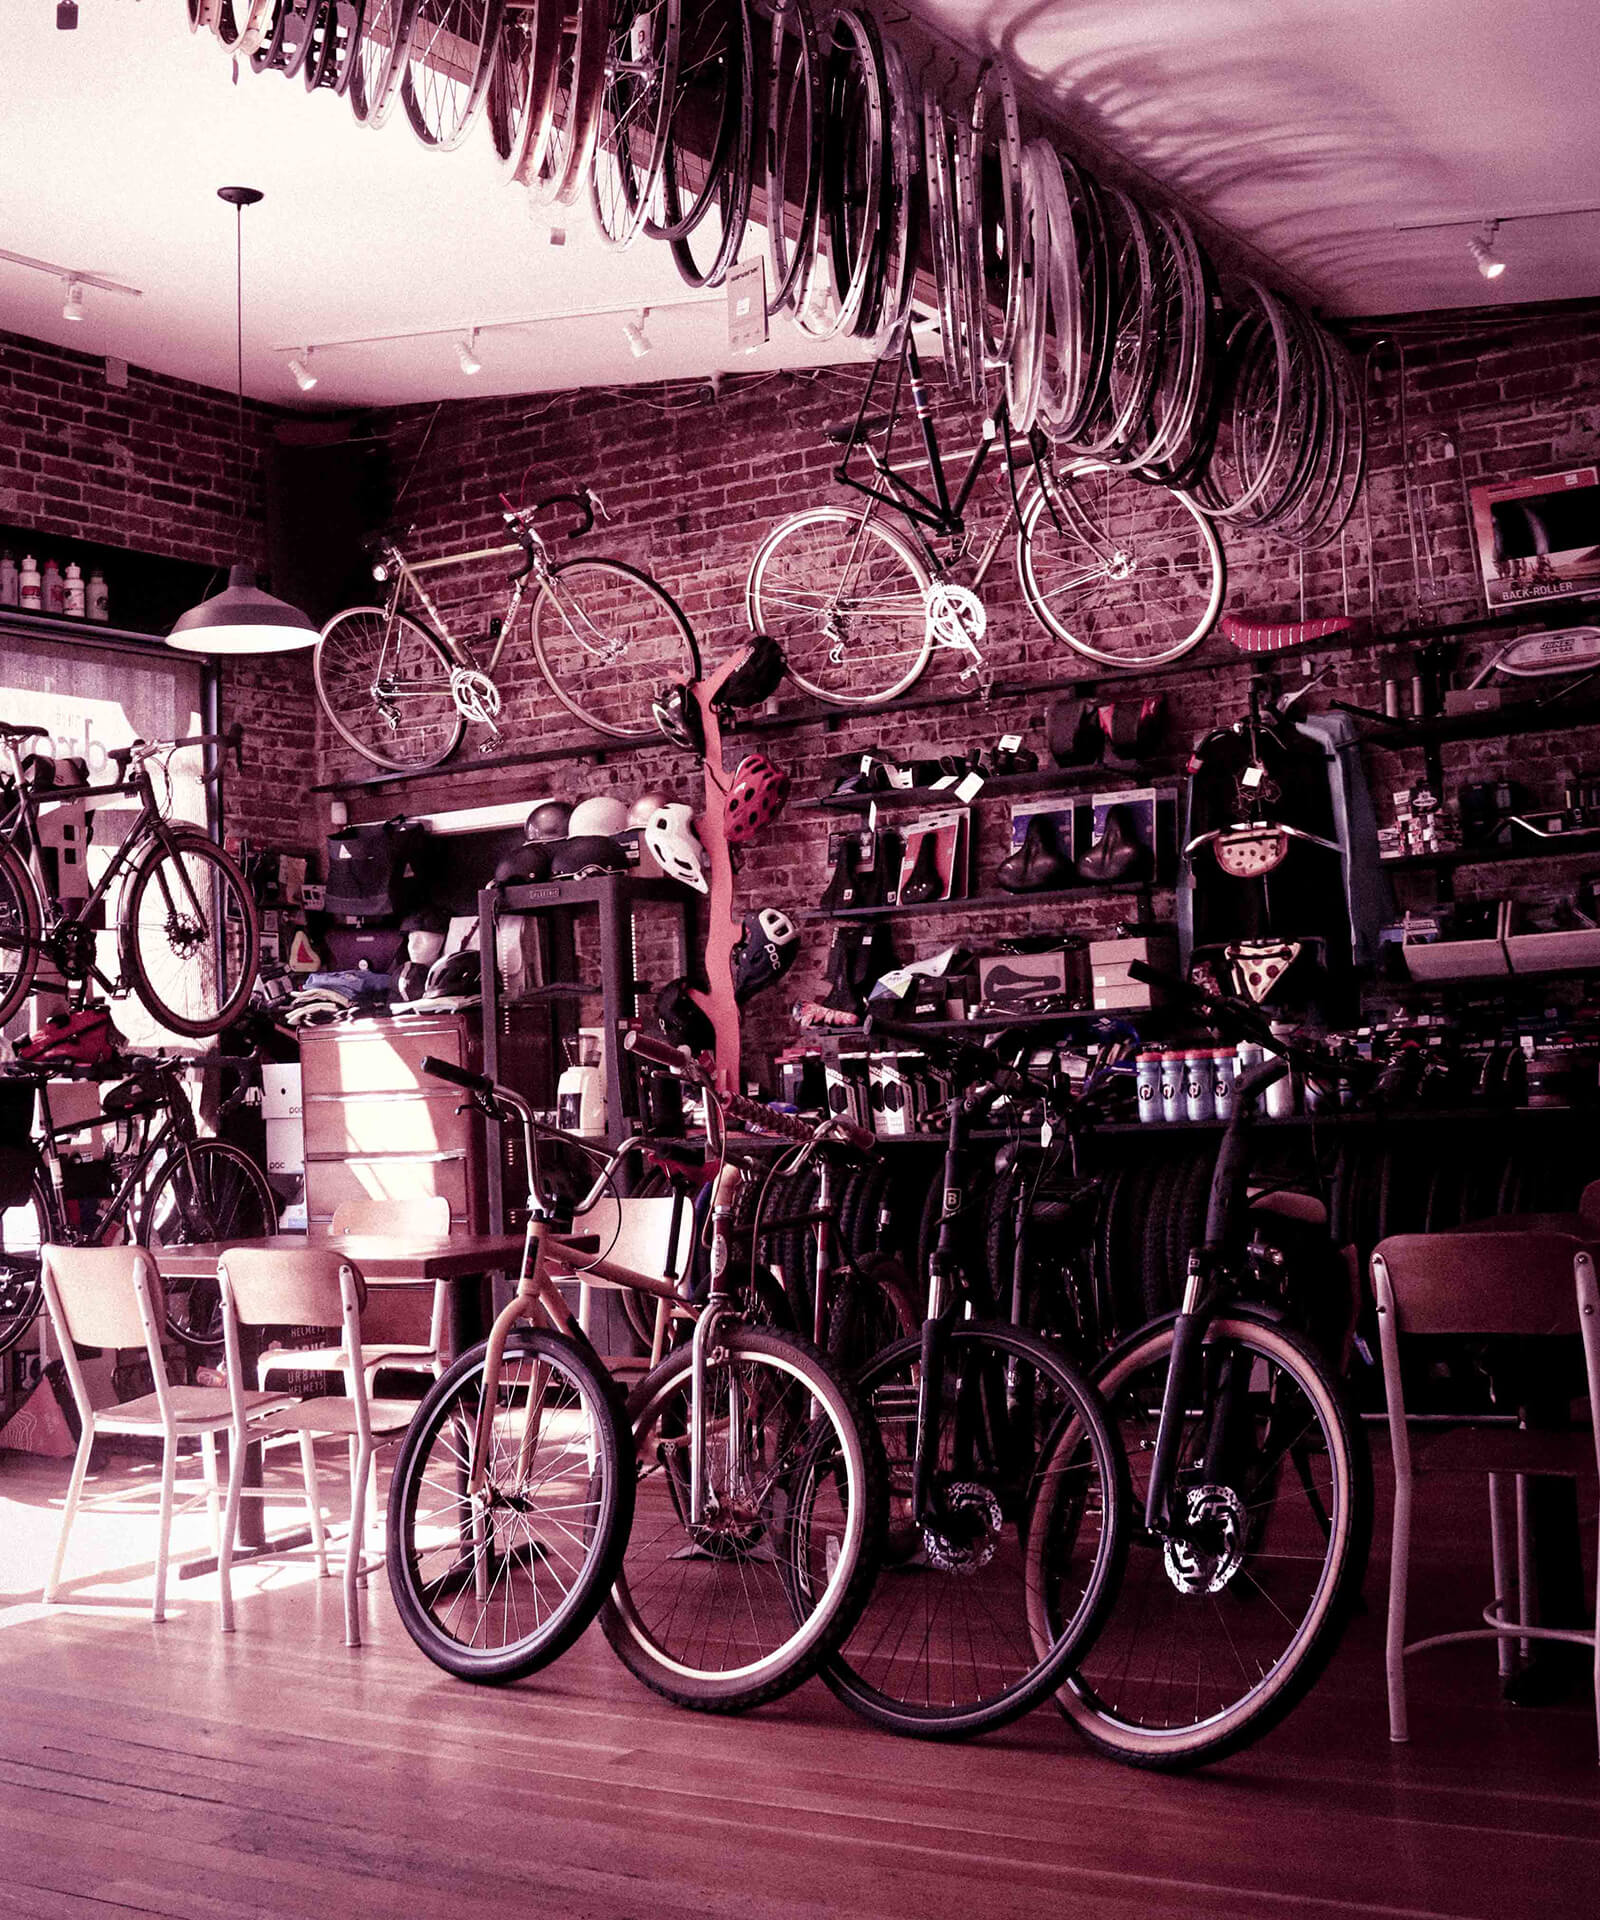 Inside of a retail bike shop.